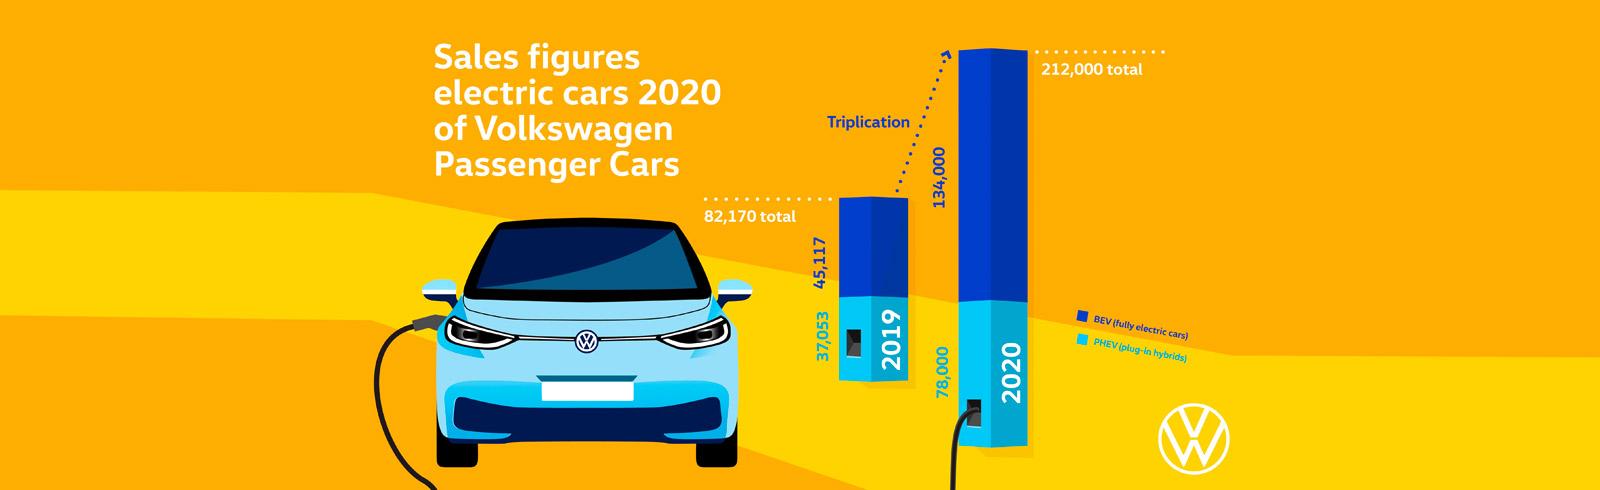 The Volkswagen brand increases tri-fold BEV deliveries in 2020